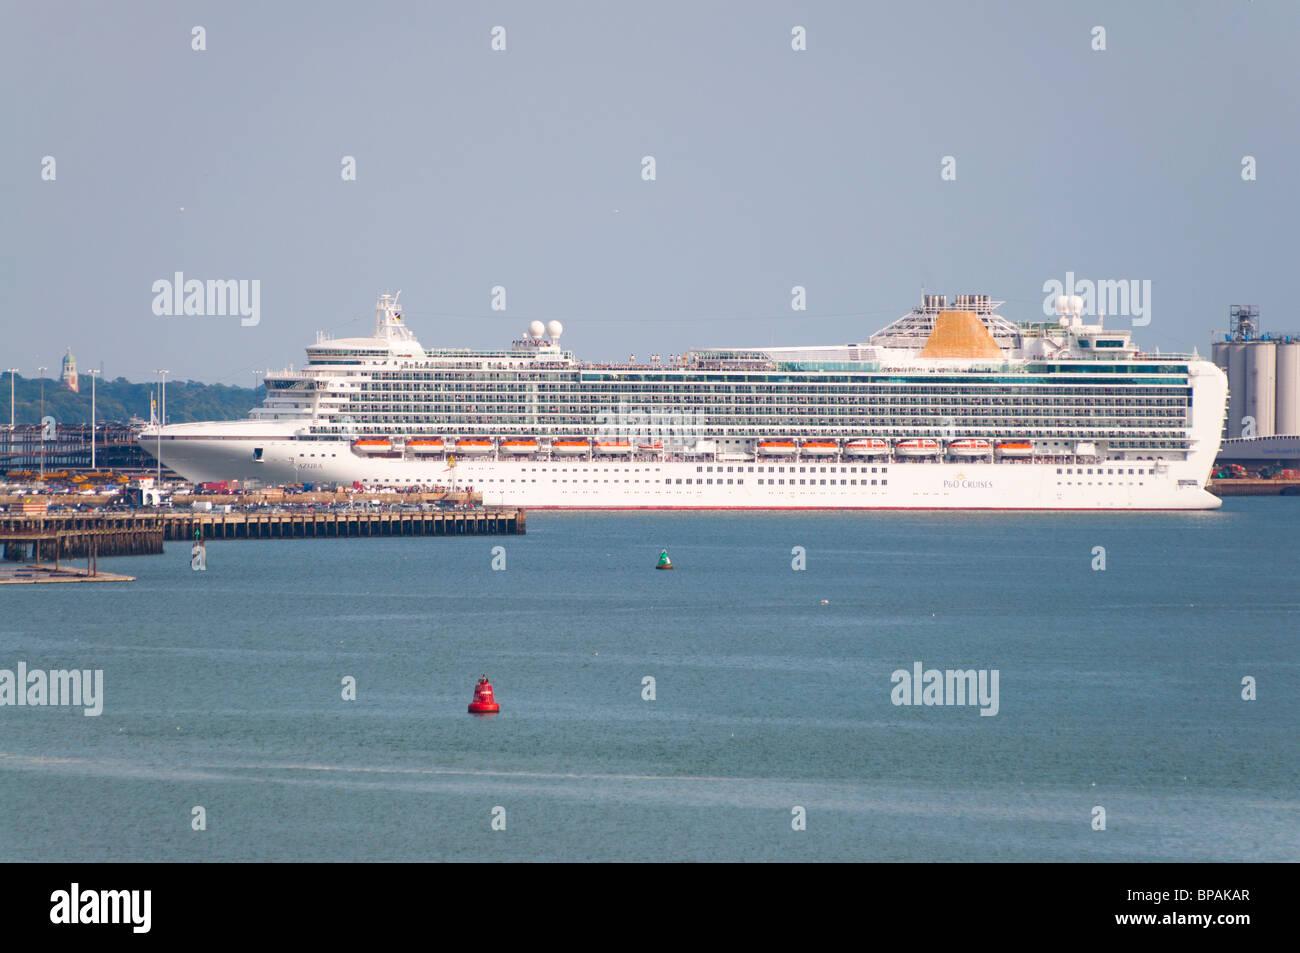 P&O's cruise ship 'Azura' in port at Southampton, England. - Stock Image